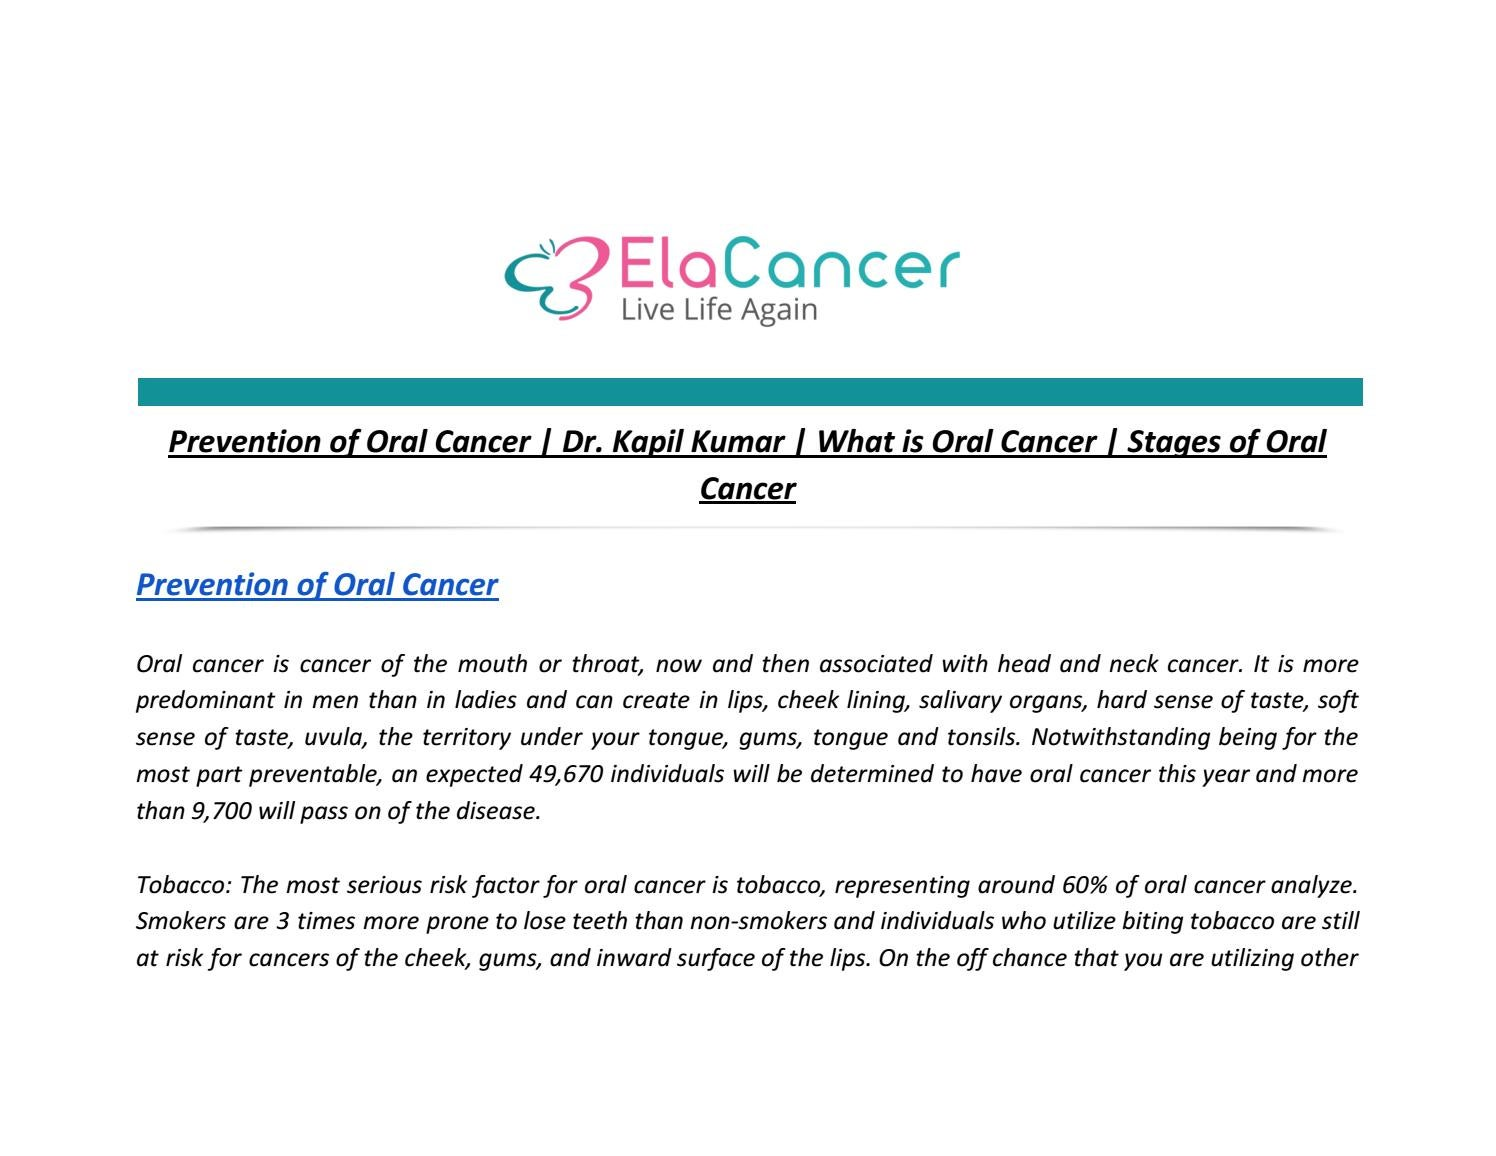 Prevention of Oral Cancer | Dr  Kapil Kumar | What is Oral